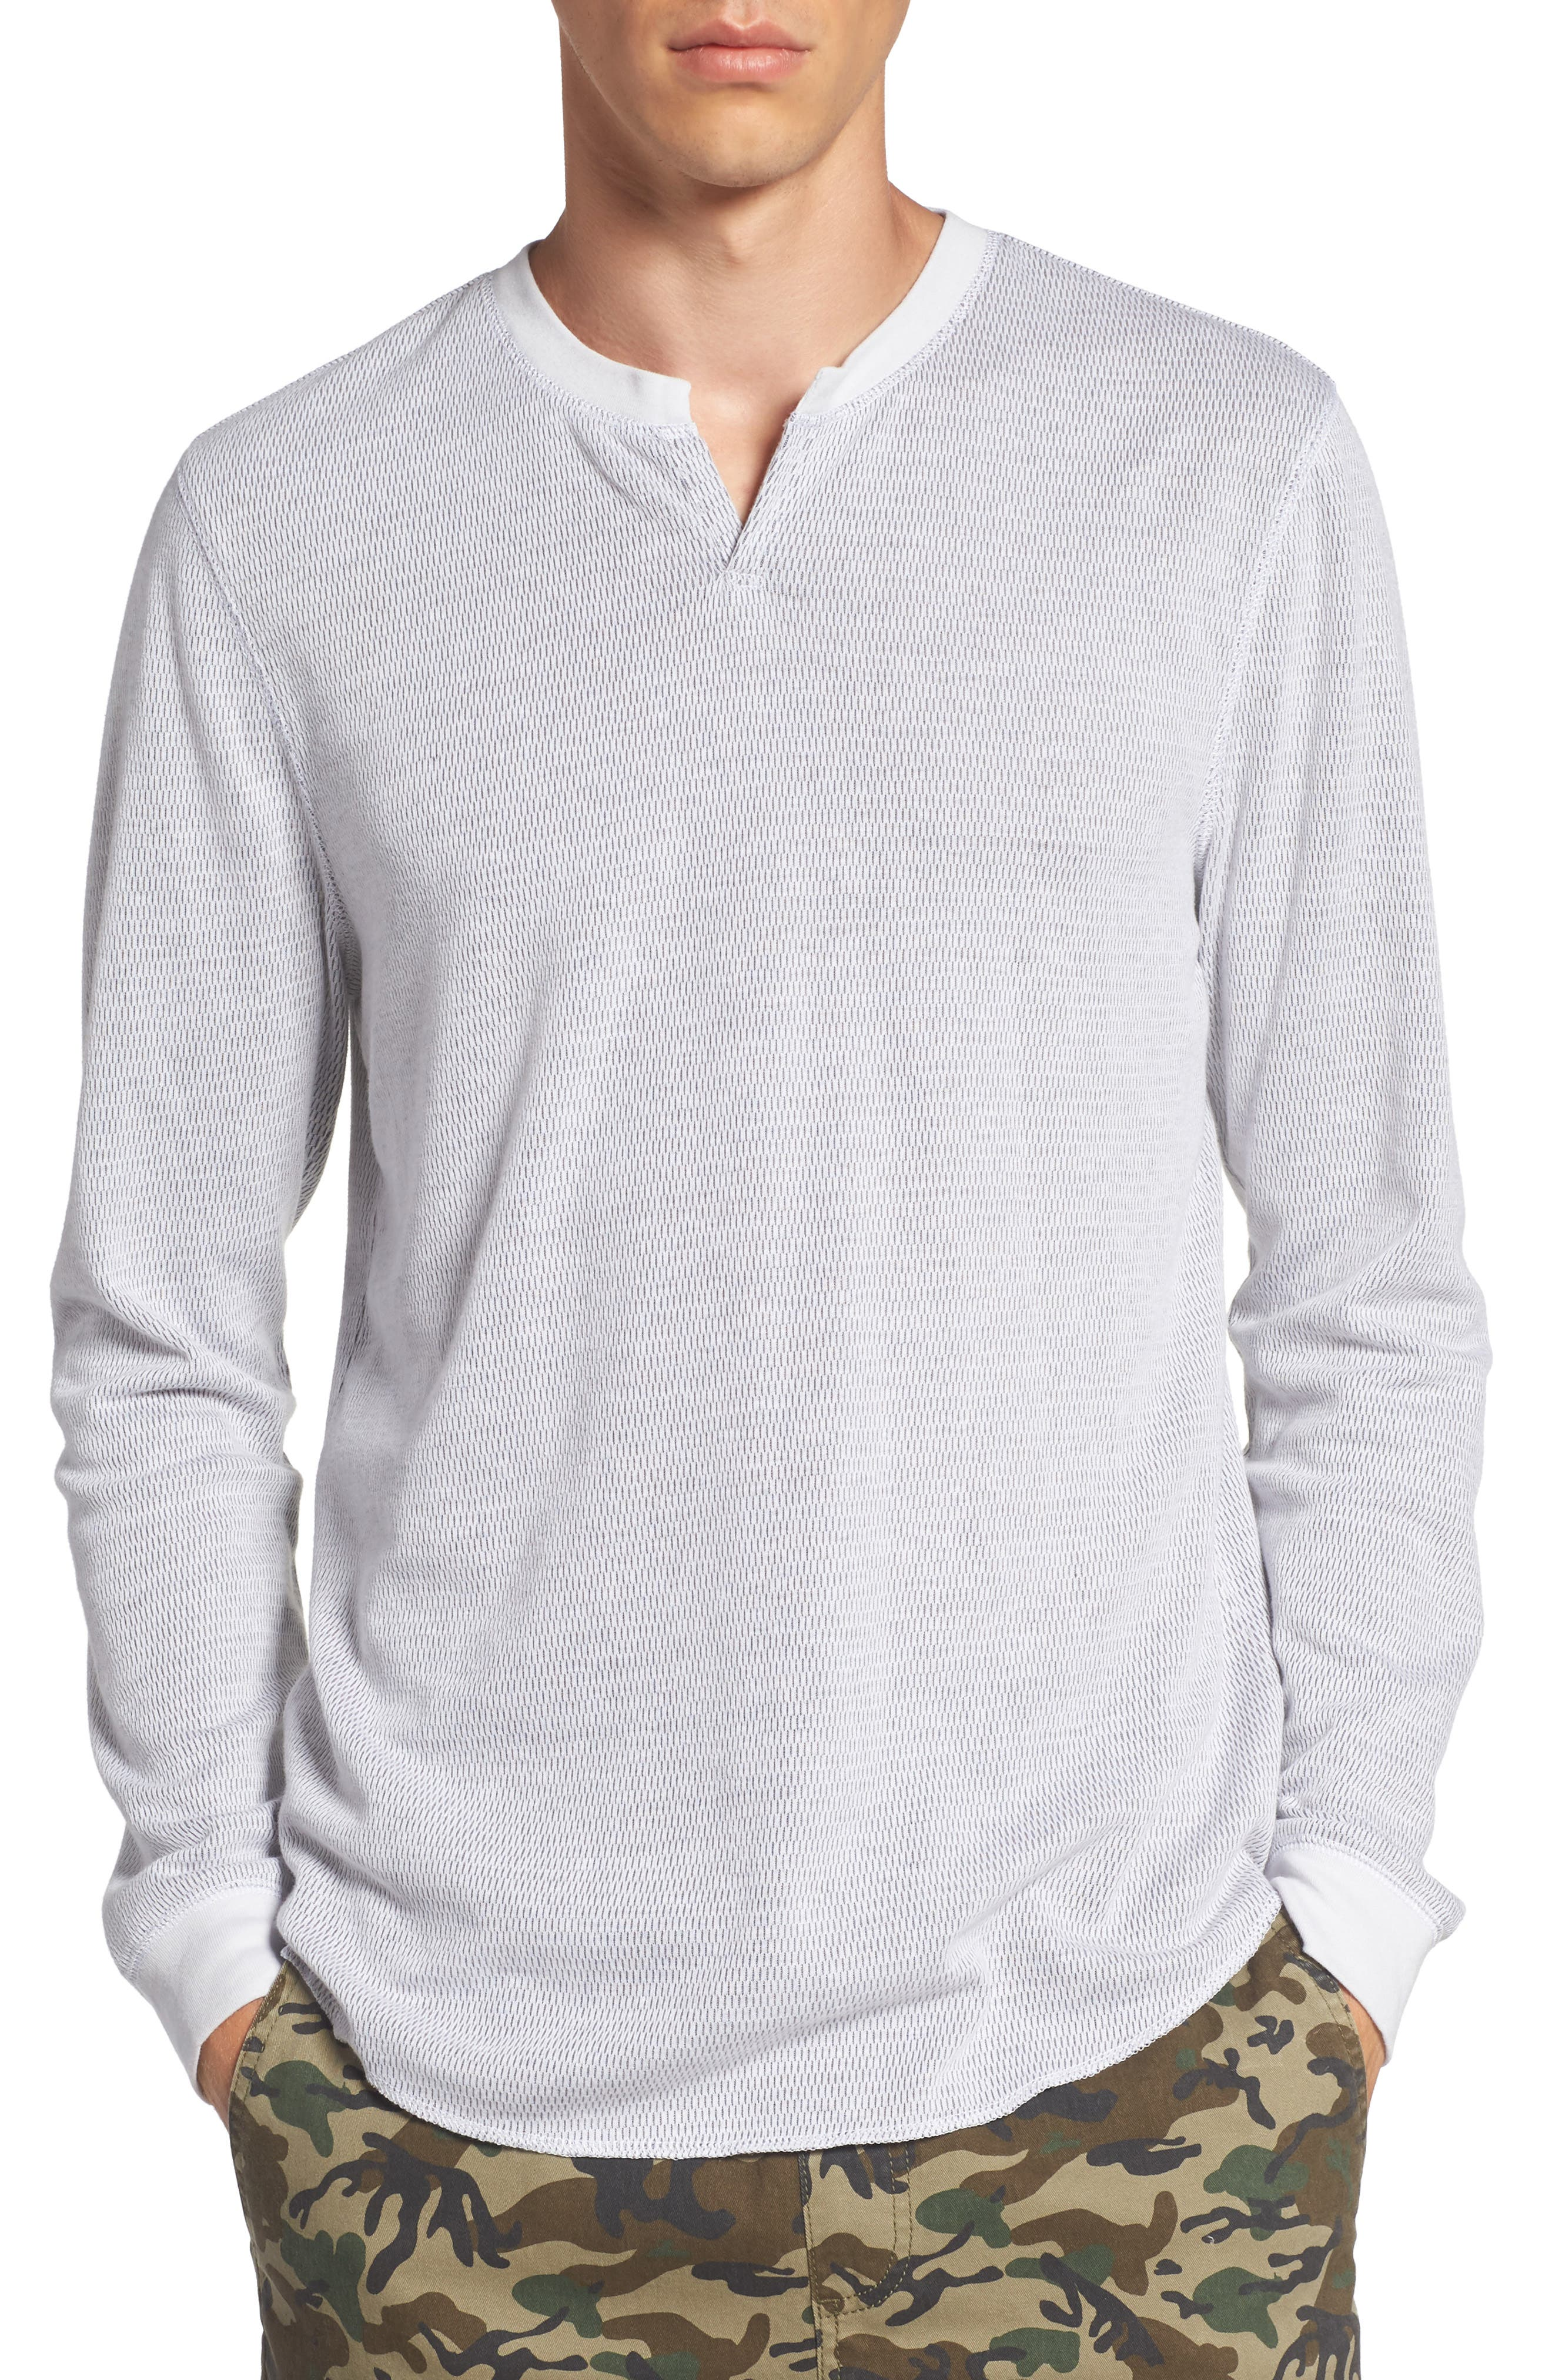 Notch Neck Thermal T-Shirt,                             Main thumbnail 3, color,